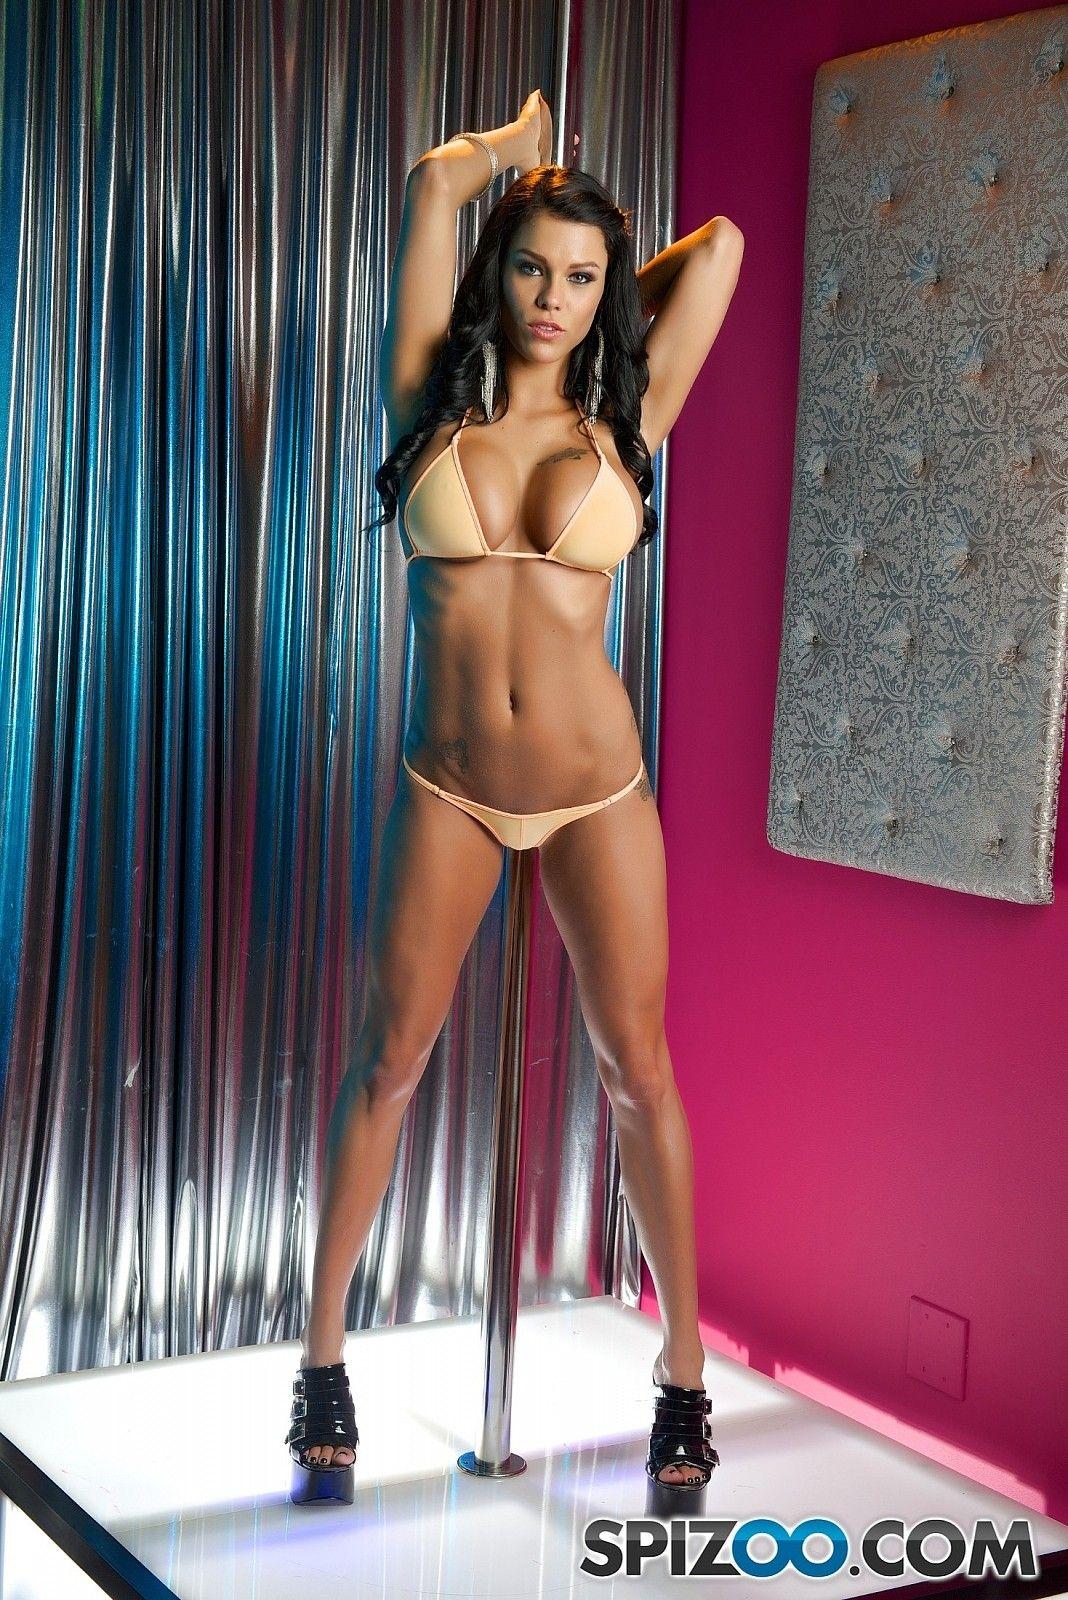 Naked sexy girl thigh boobs